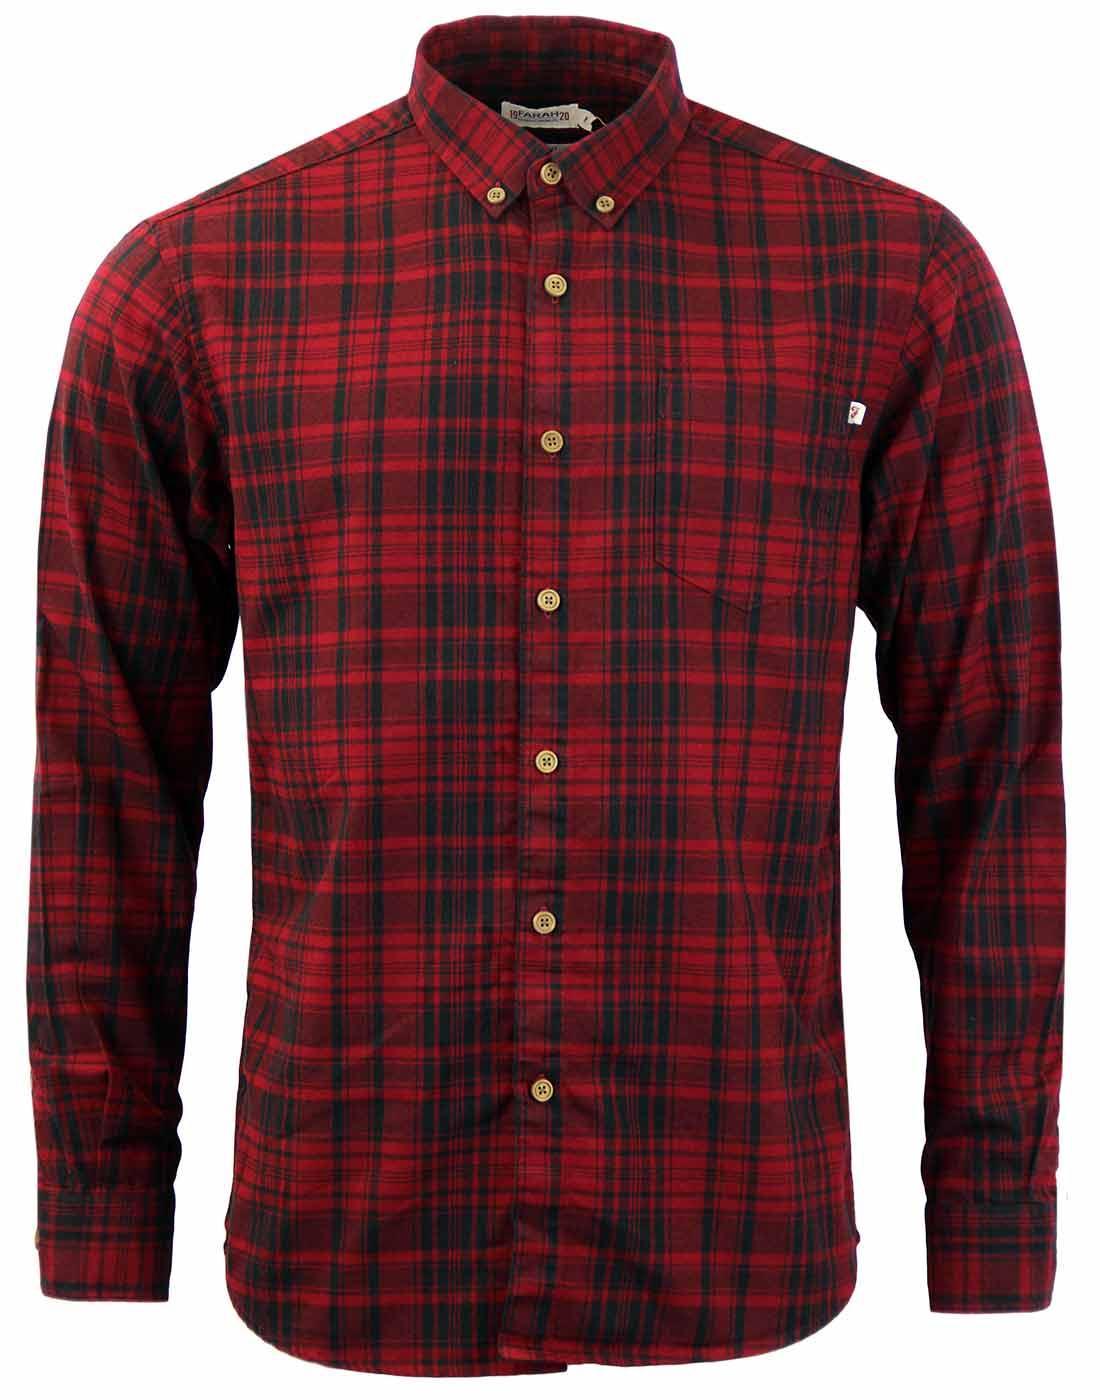 Paine FARAH 1920 Retro Brushed Cotton Check Shirt